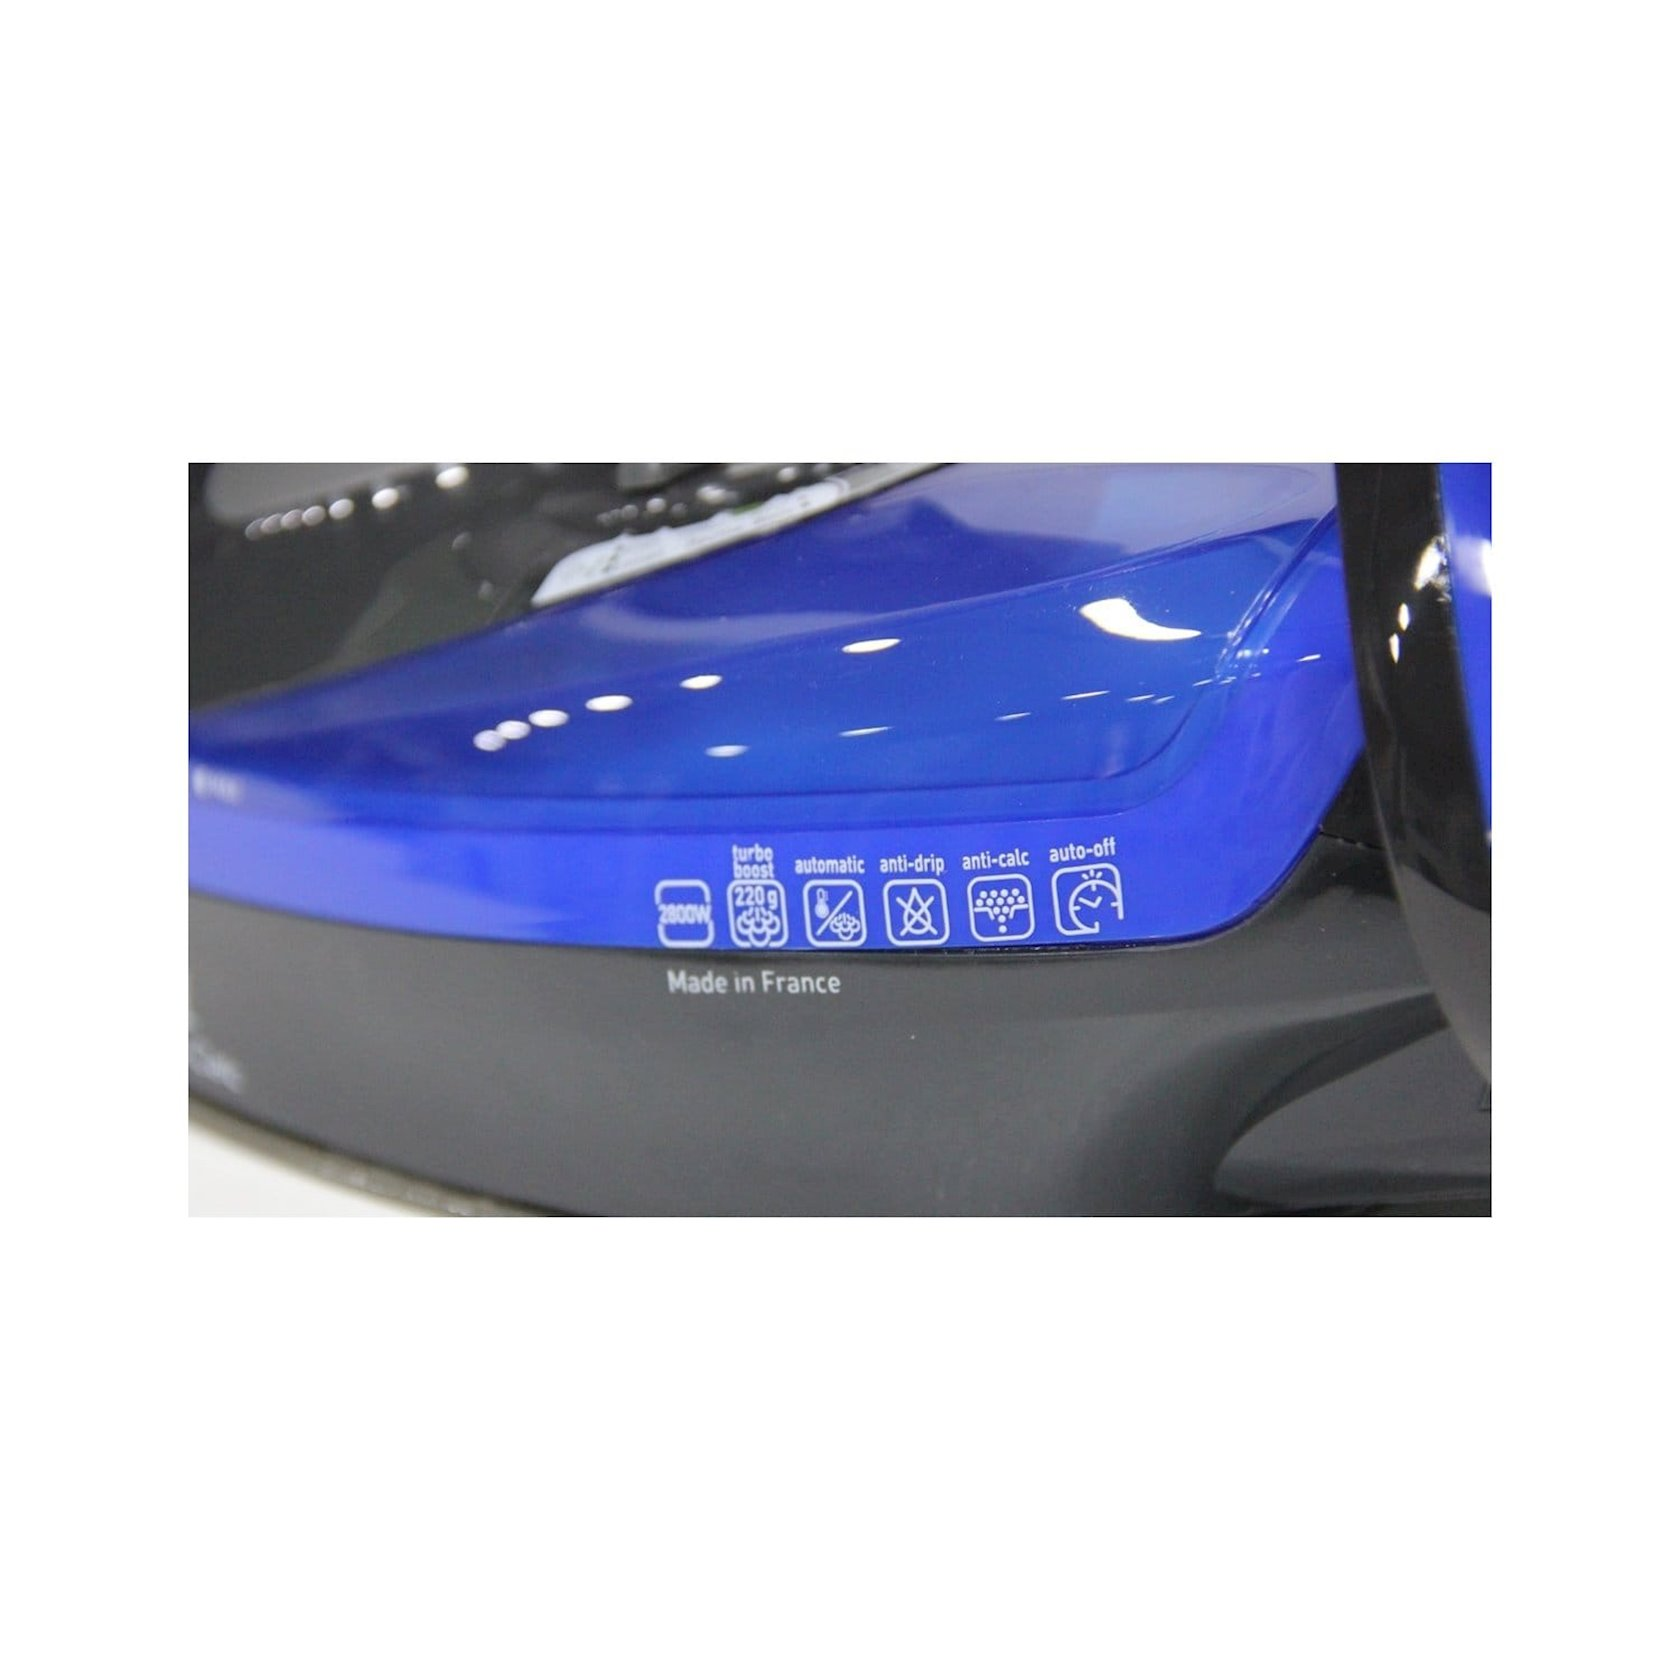 BuxarlıütüTefal Turbo Pro FV5688